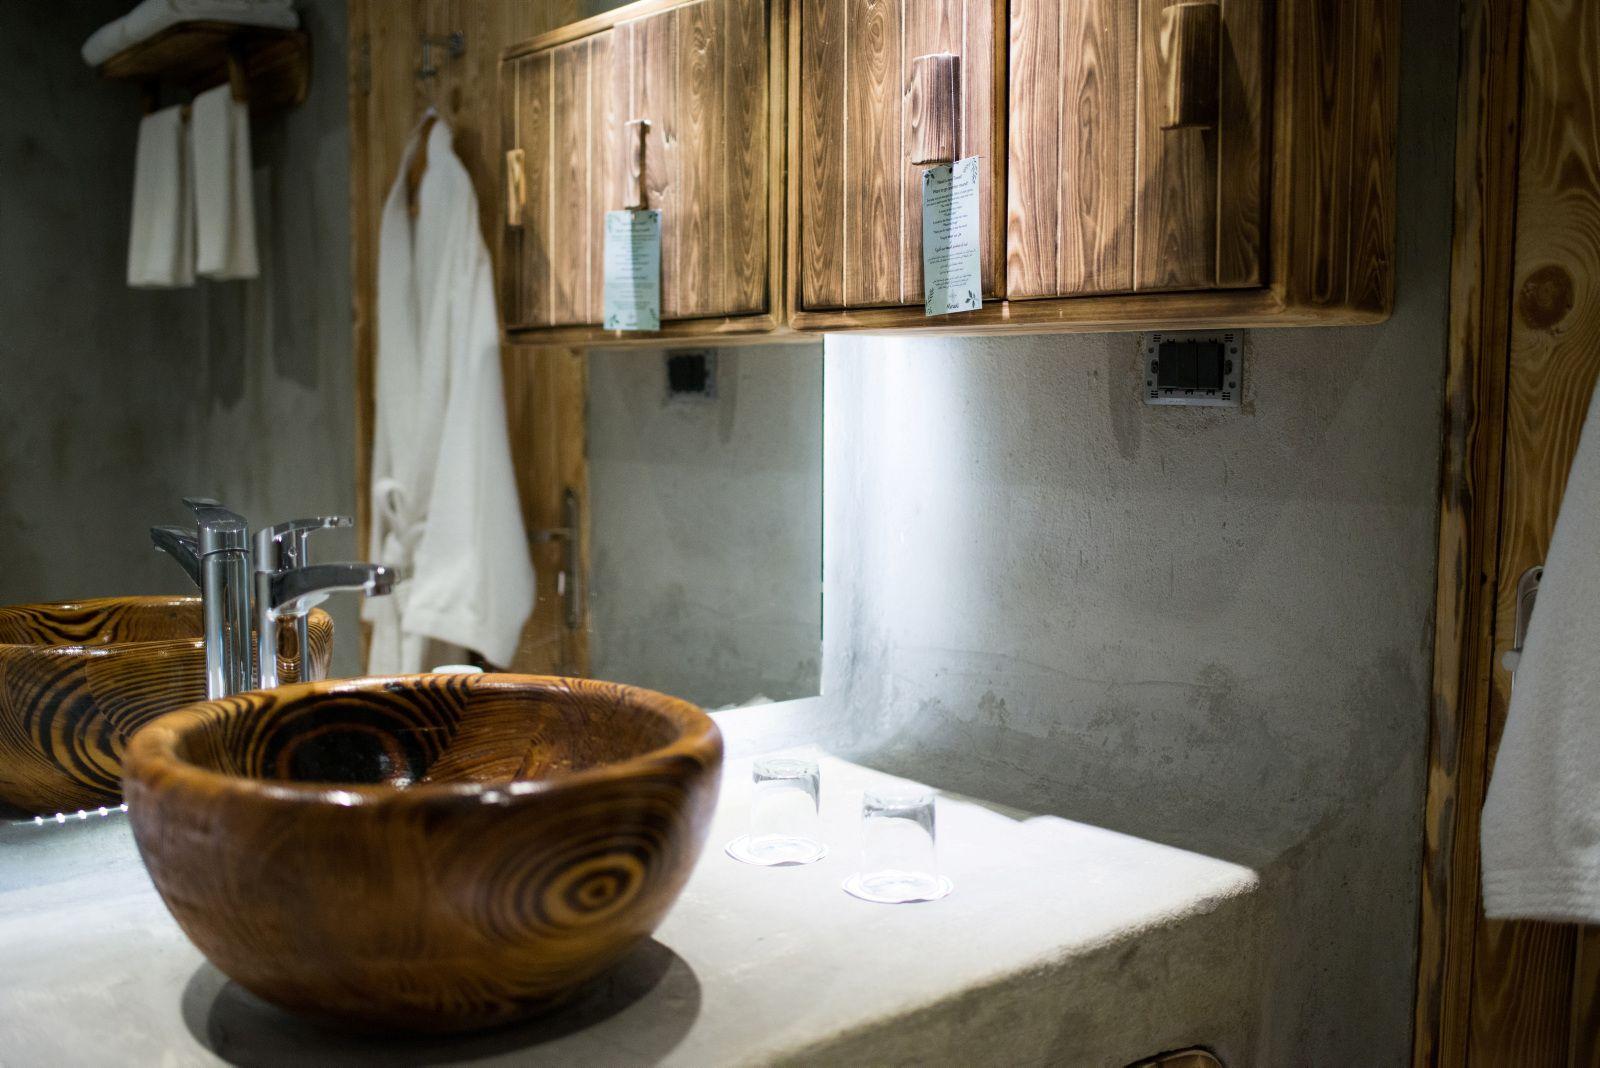 Badkamer Beton Interieur : Meraki resort egypte hurghada afrika interieur badkamer